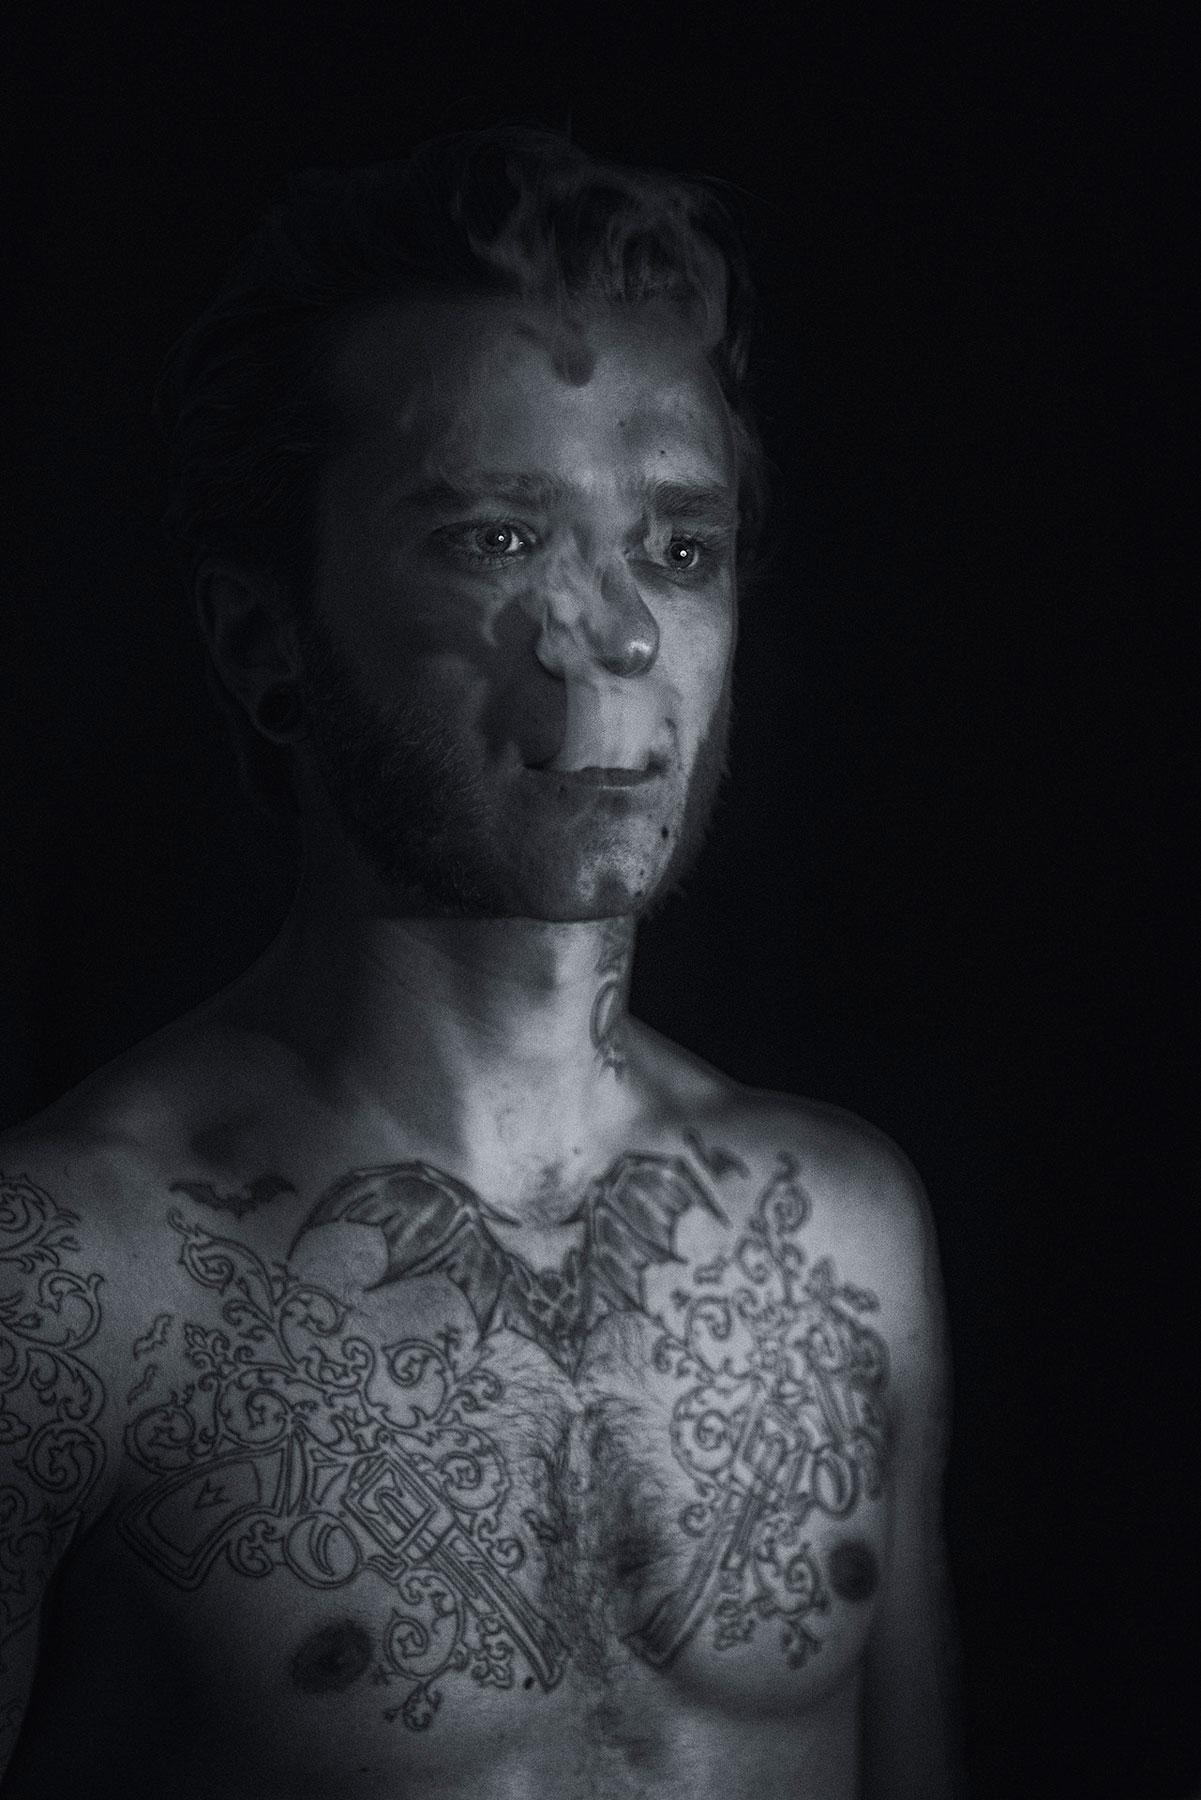 arther-optera-tattoo-artist-smoke.jpg